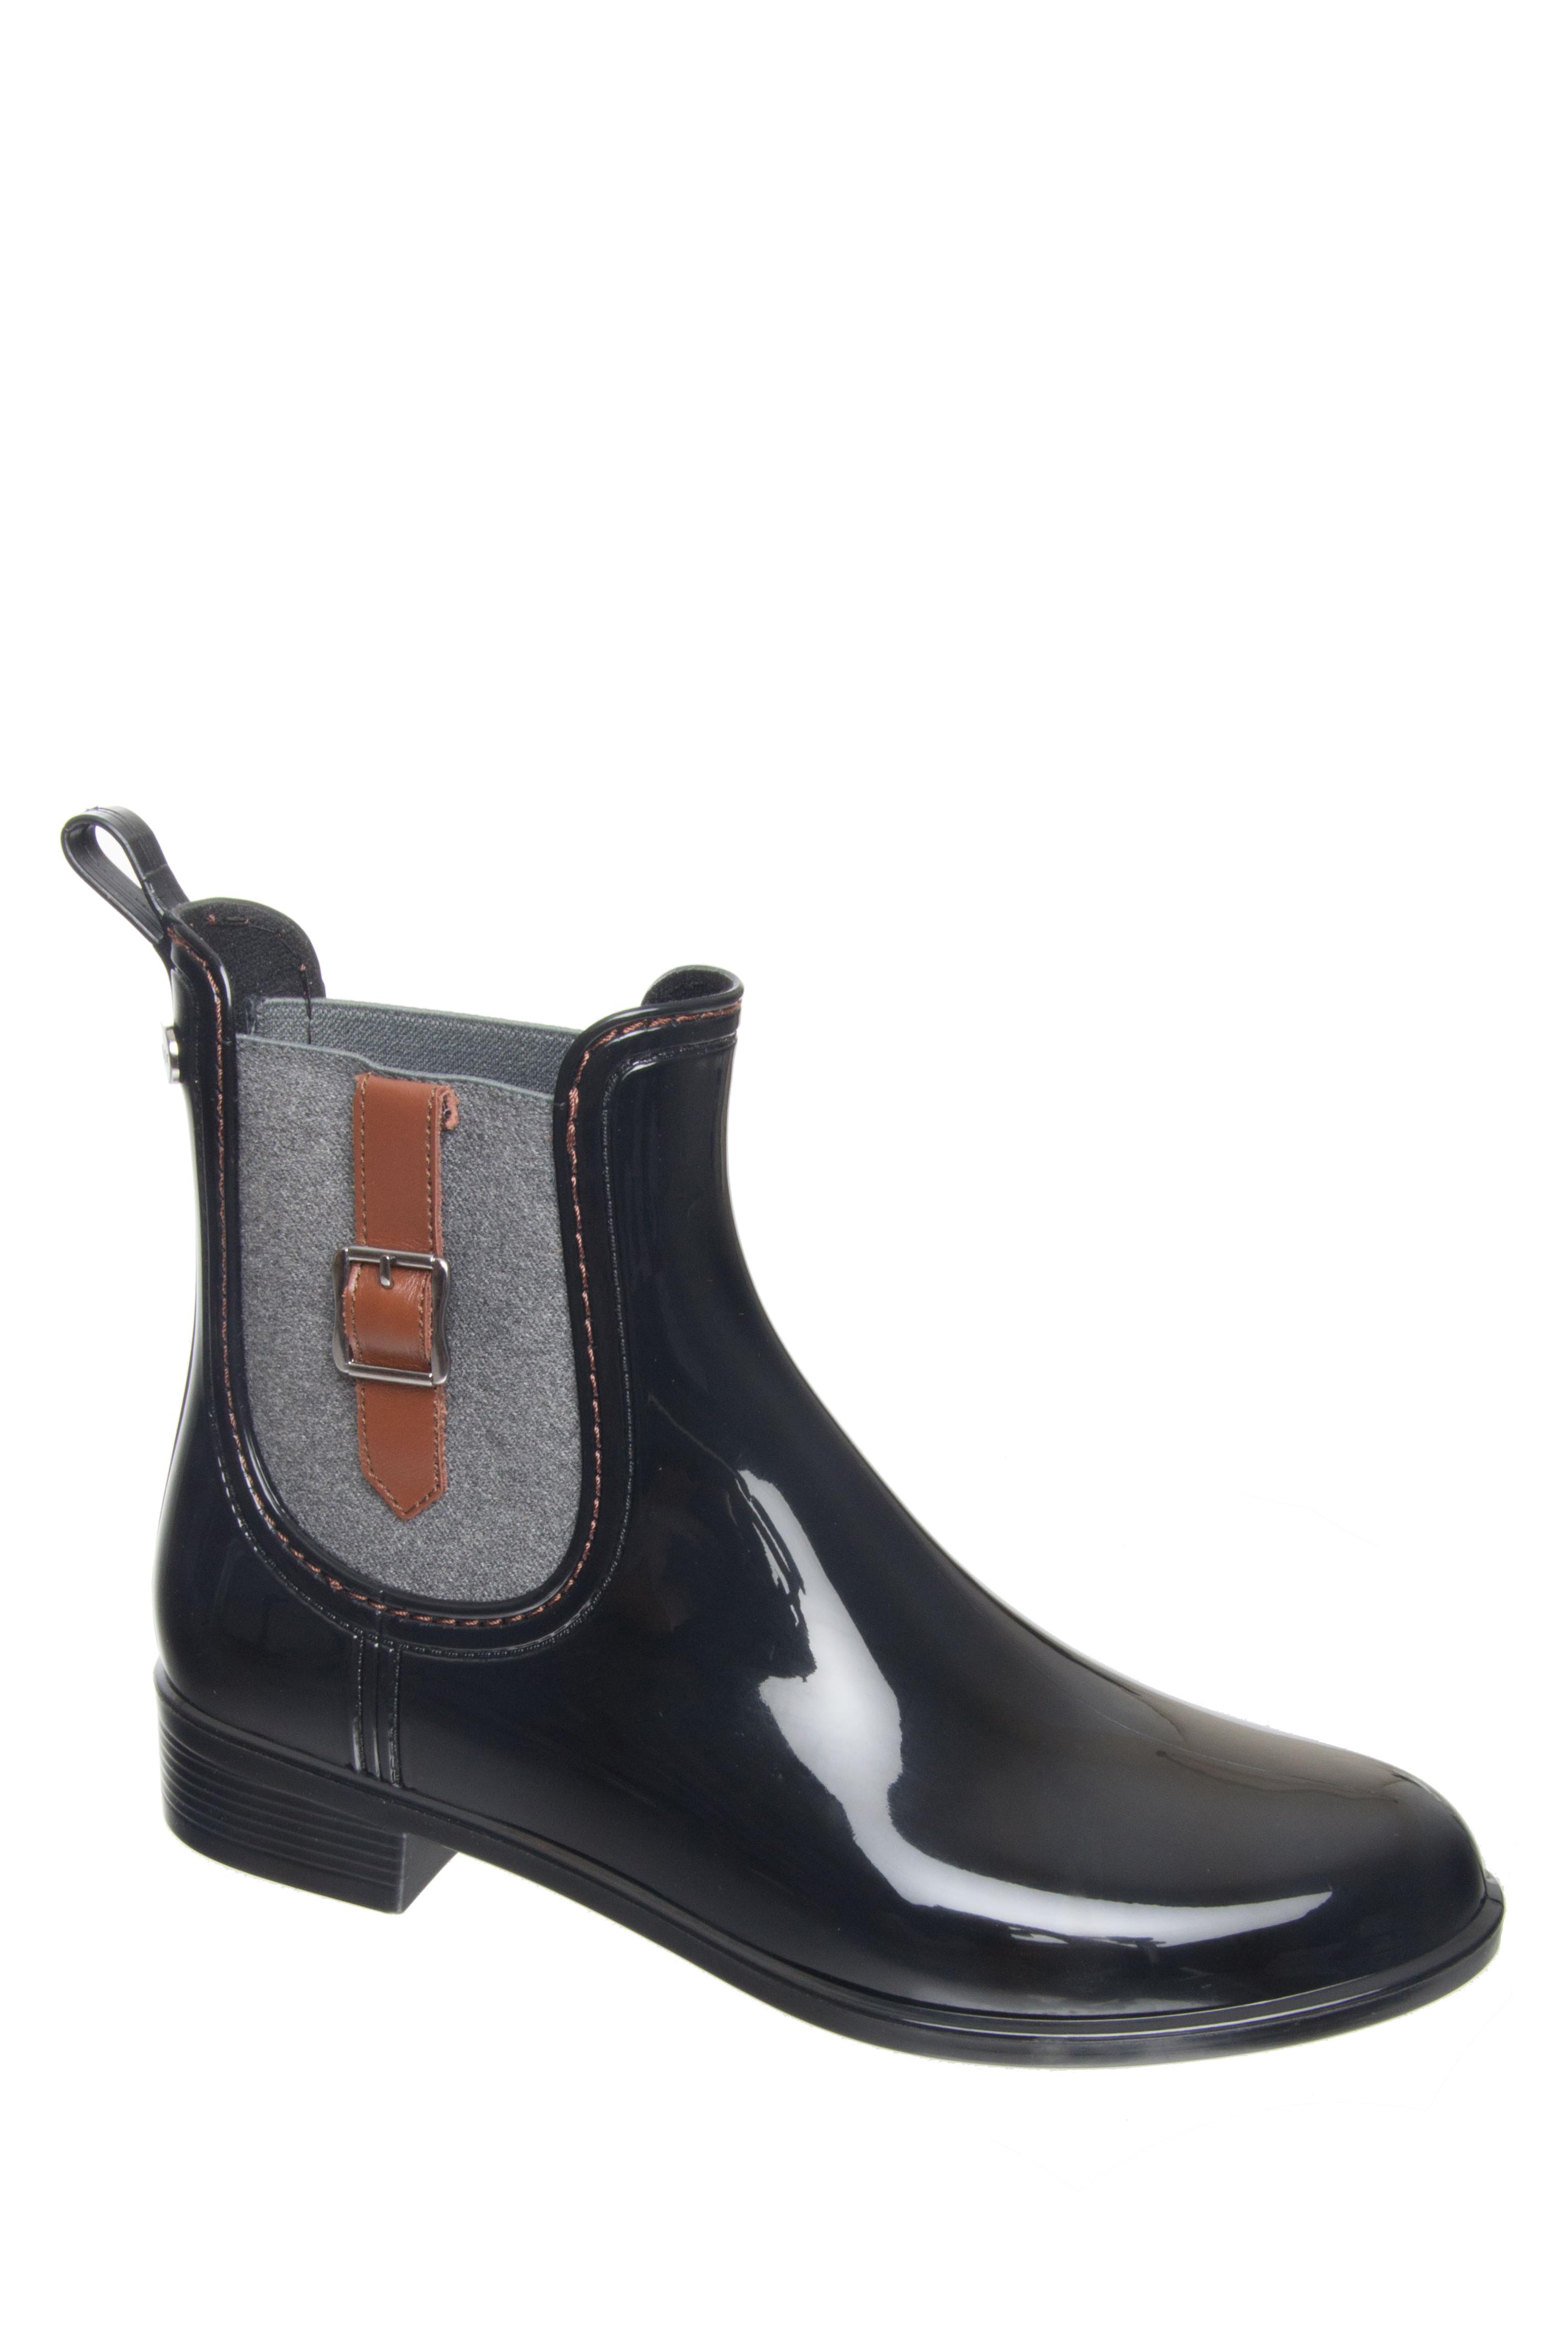 Igor Urban Buckle Rain Boots - Black